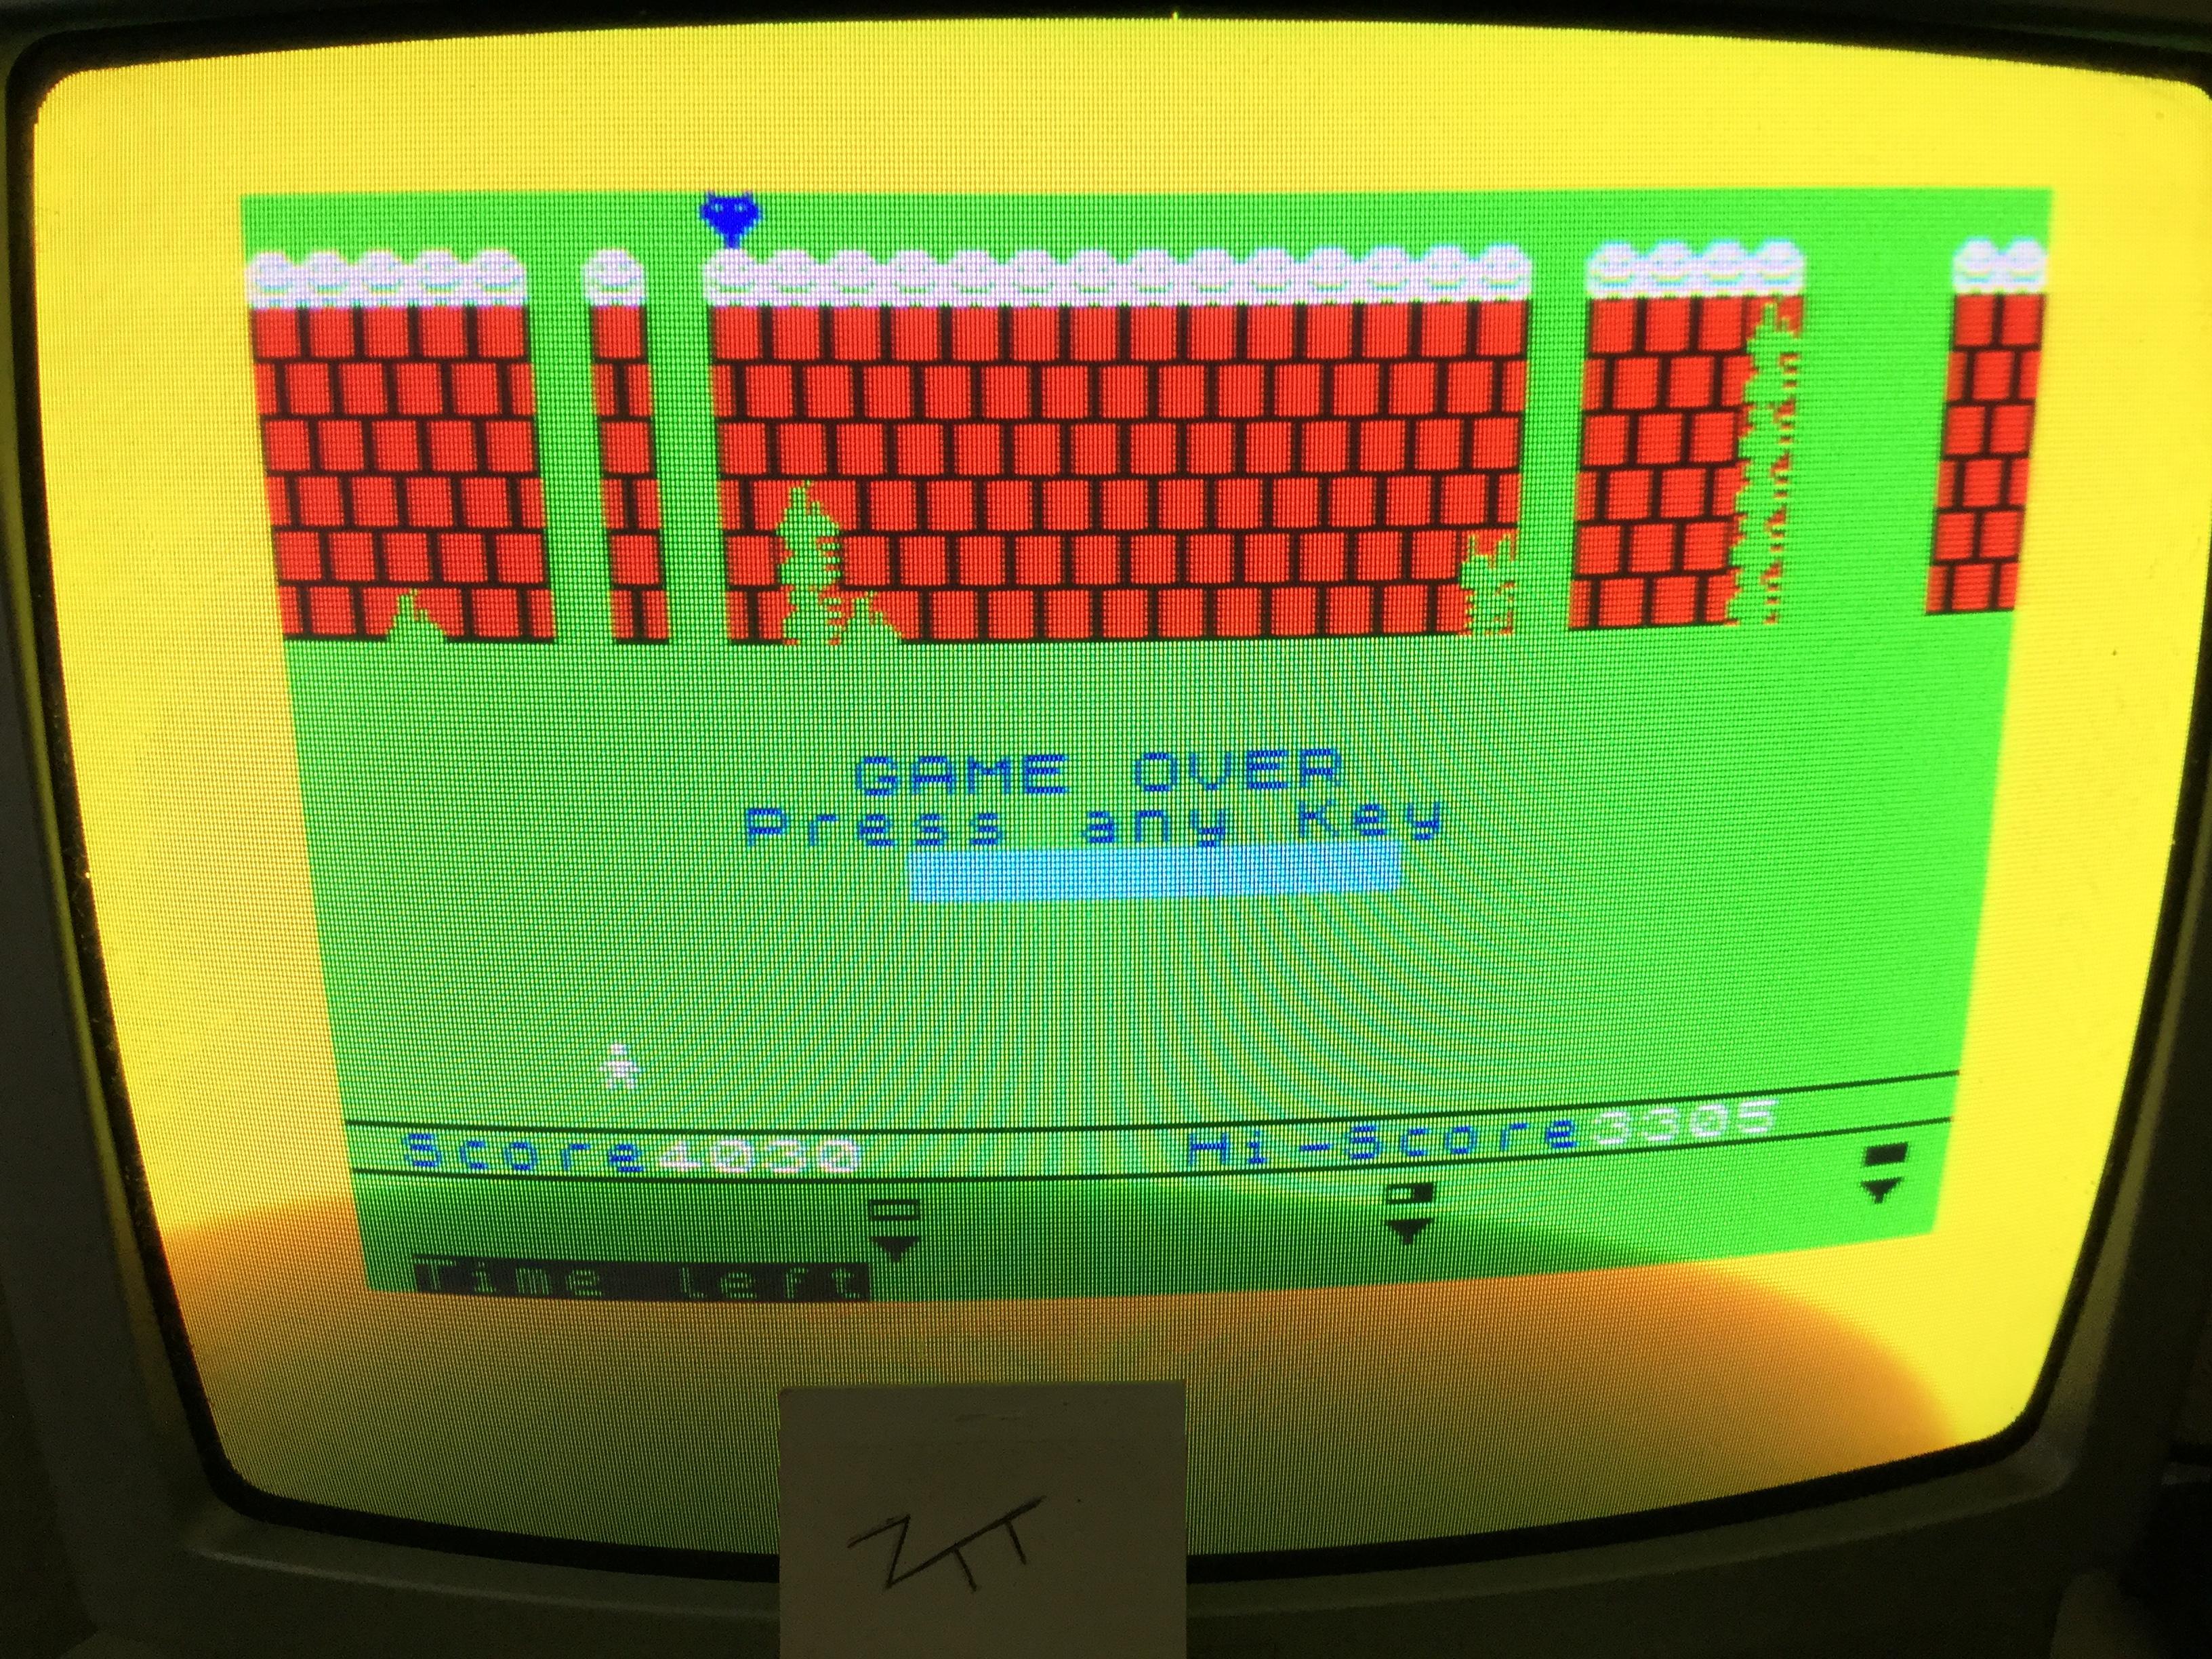 Frankie: Alien Kill [Mastertronic] [Easy] (ZX Spectrum) 4,030 points on 2017-06-10 07:13:26